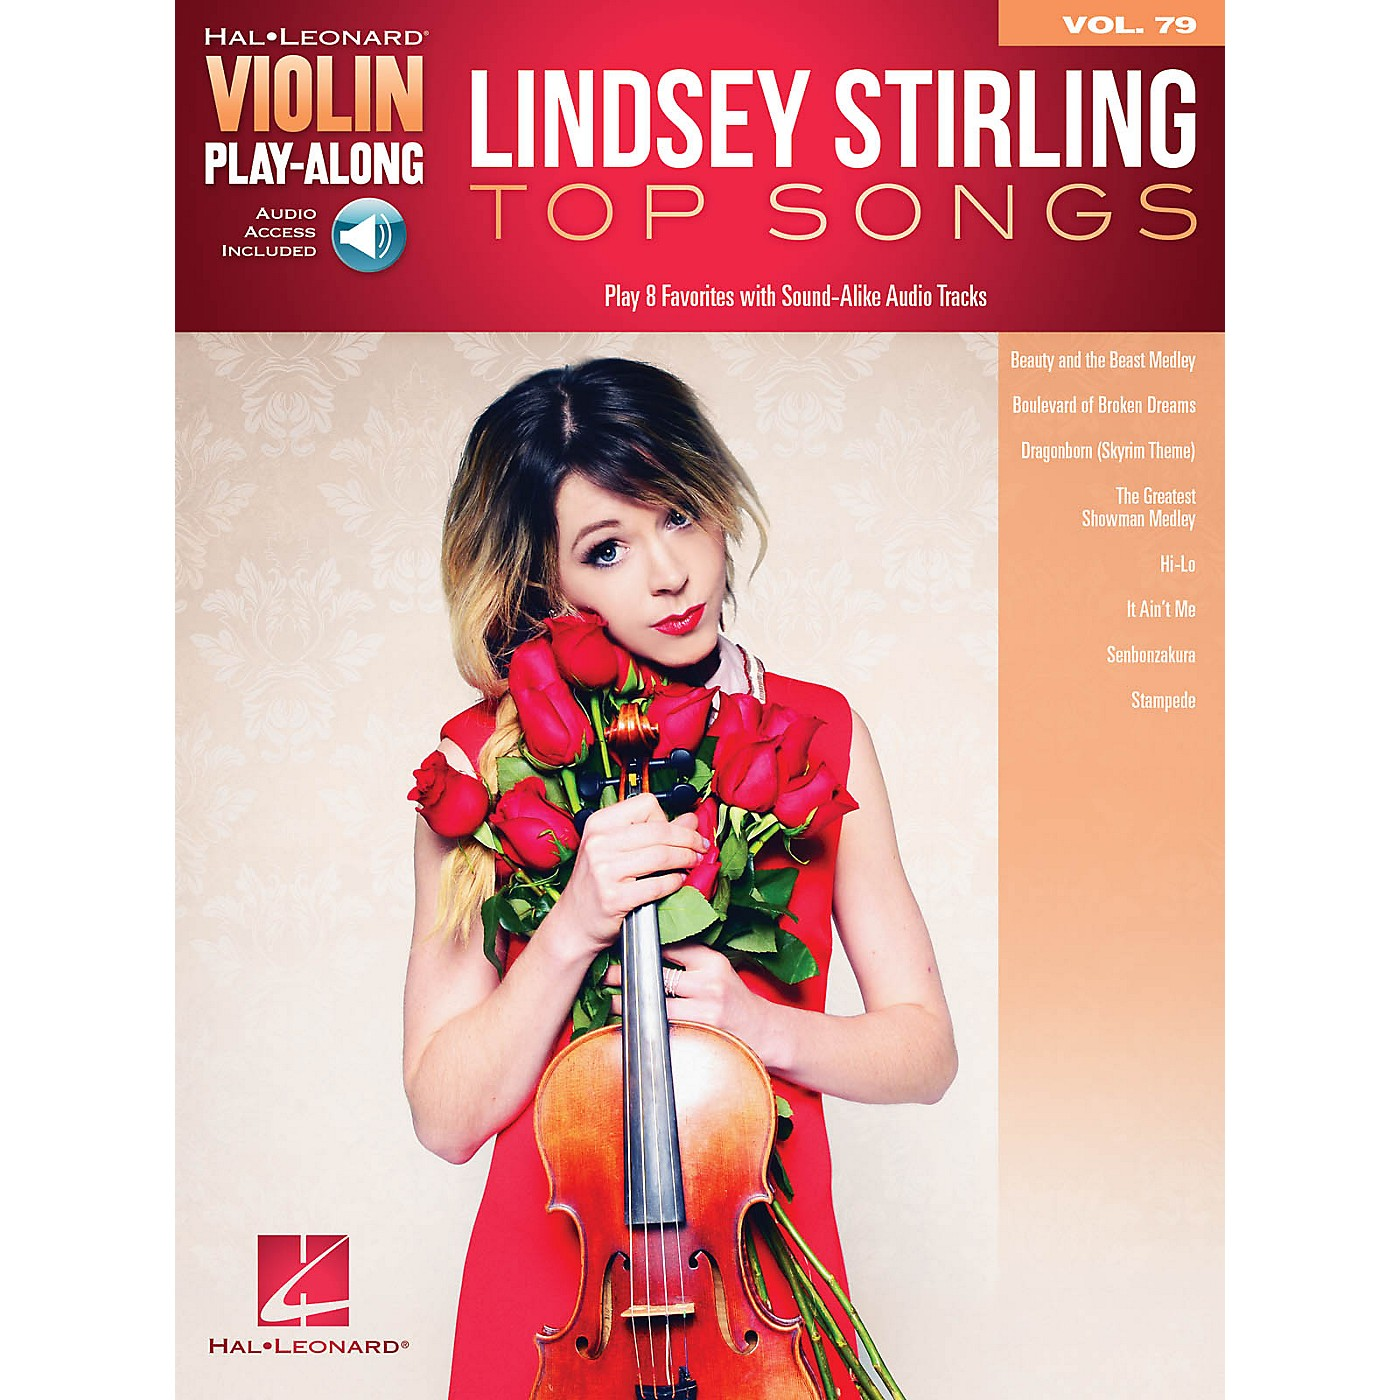 Hal Leonard Lindsey Stirling - Top Songs Violin Play-Along Volume 79 Book/Audio Online thumbnail